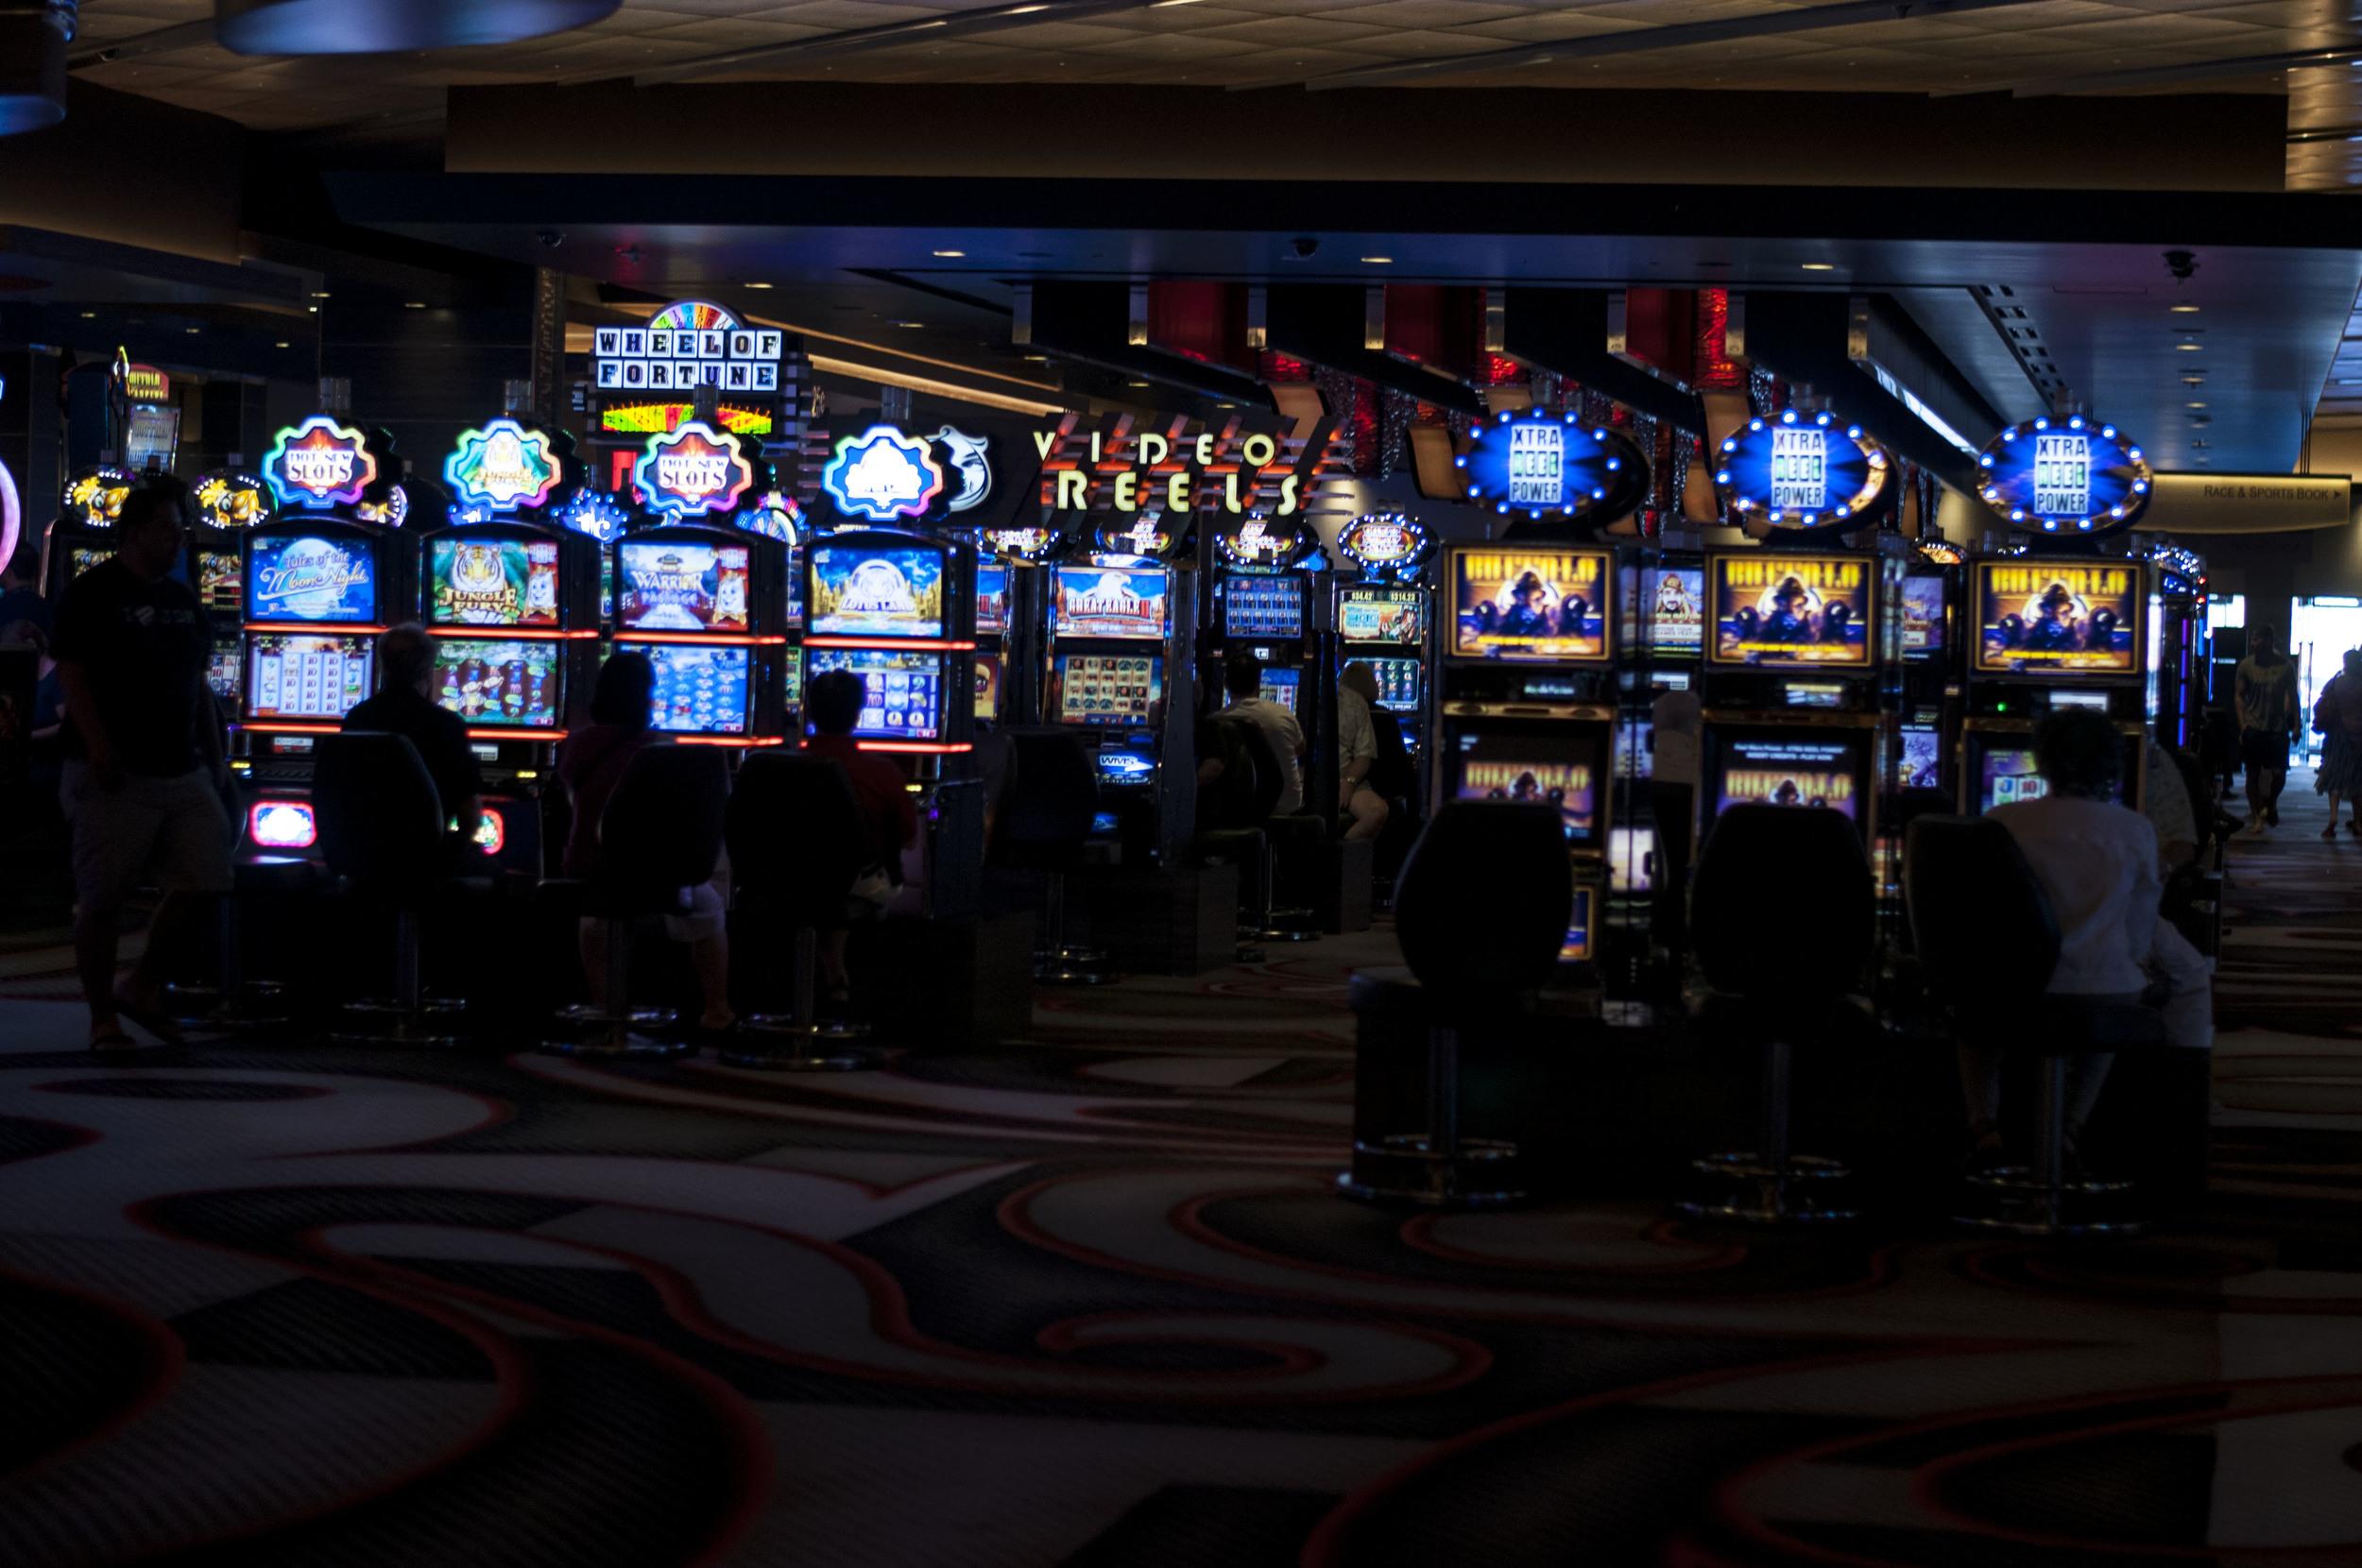 Las Vegas_31.jpg